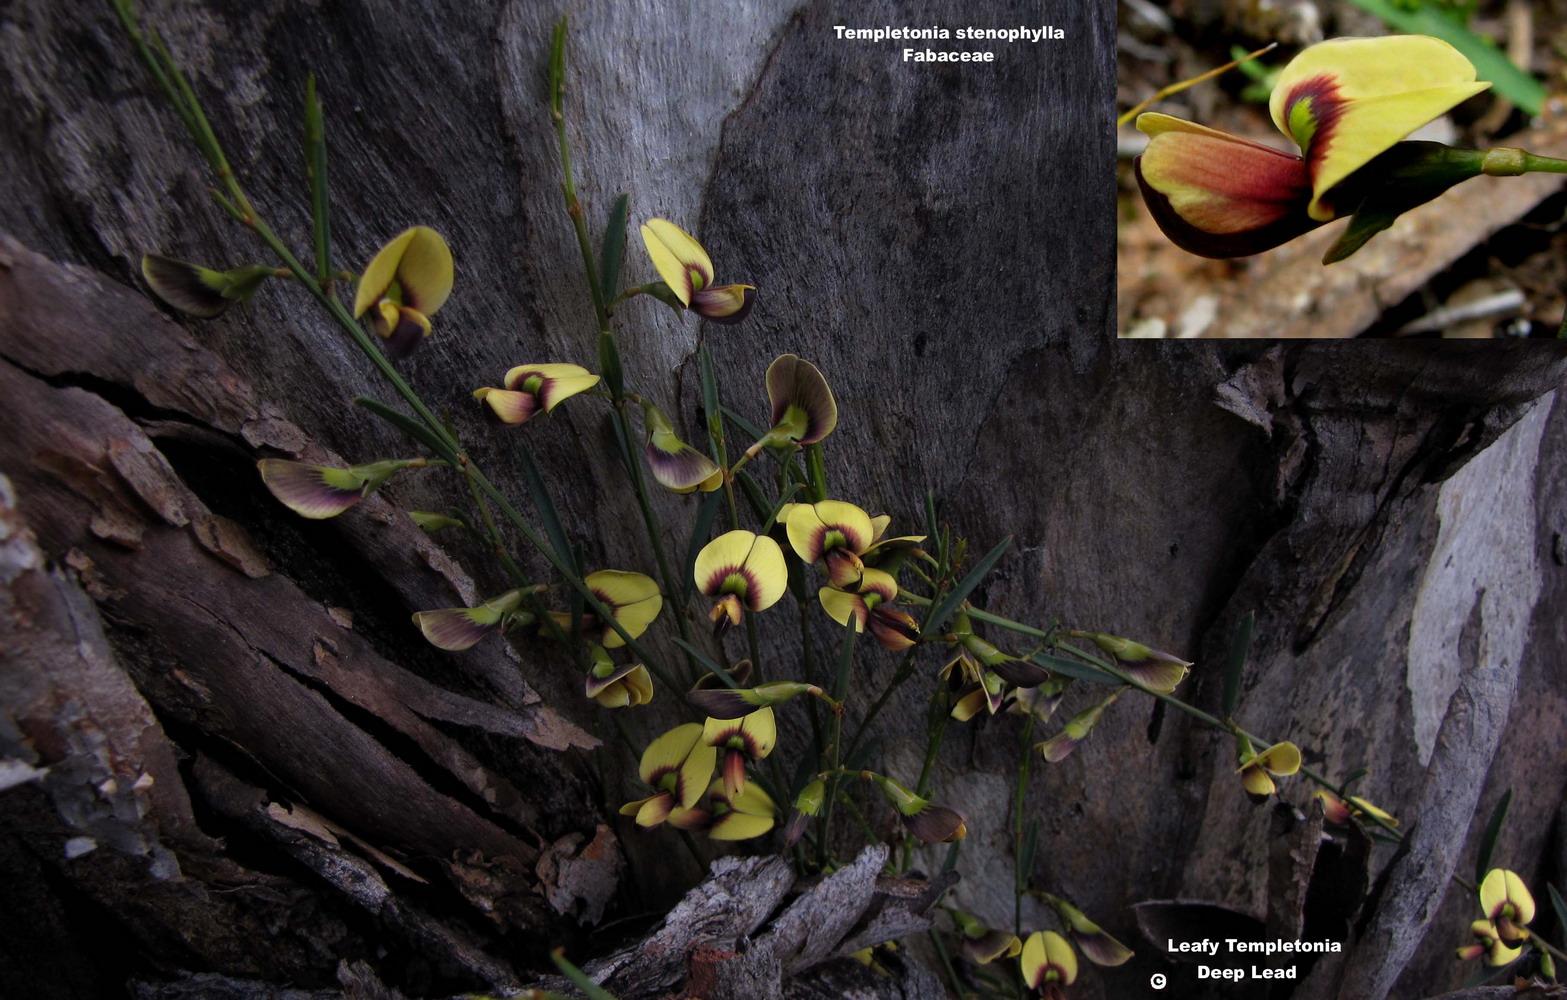 Templetonia stenophylla flora ALA source